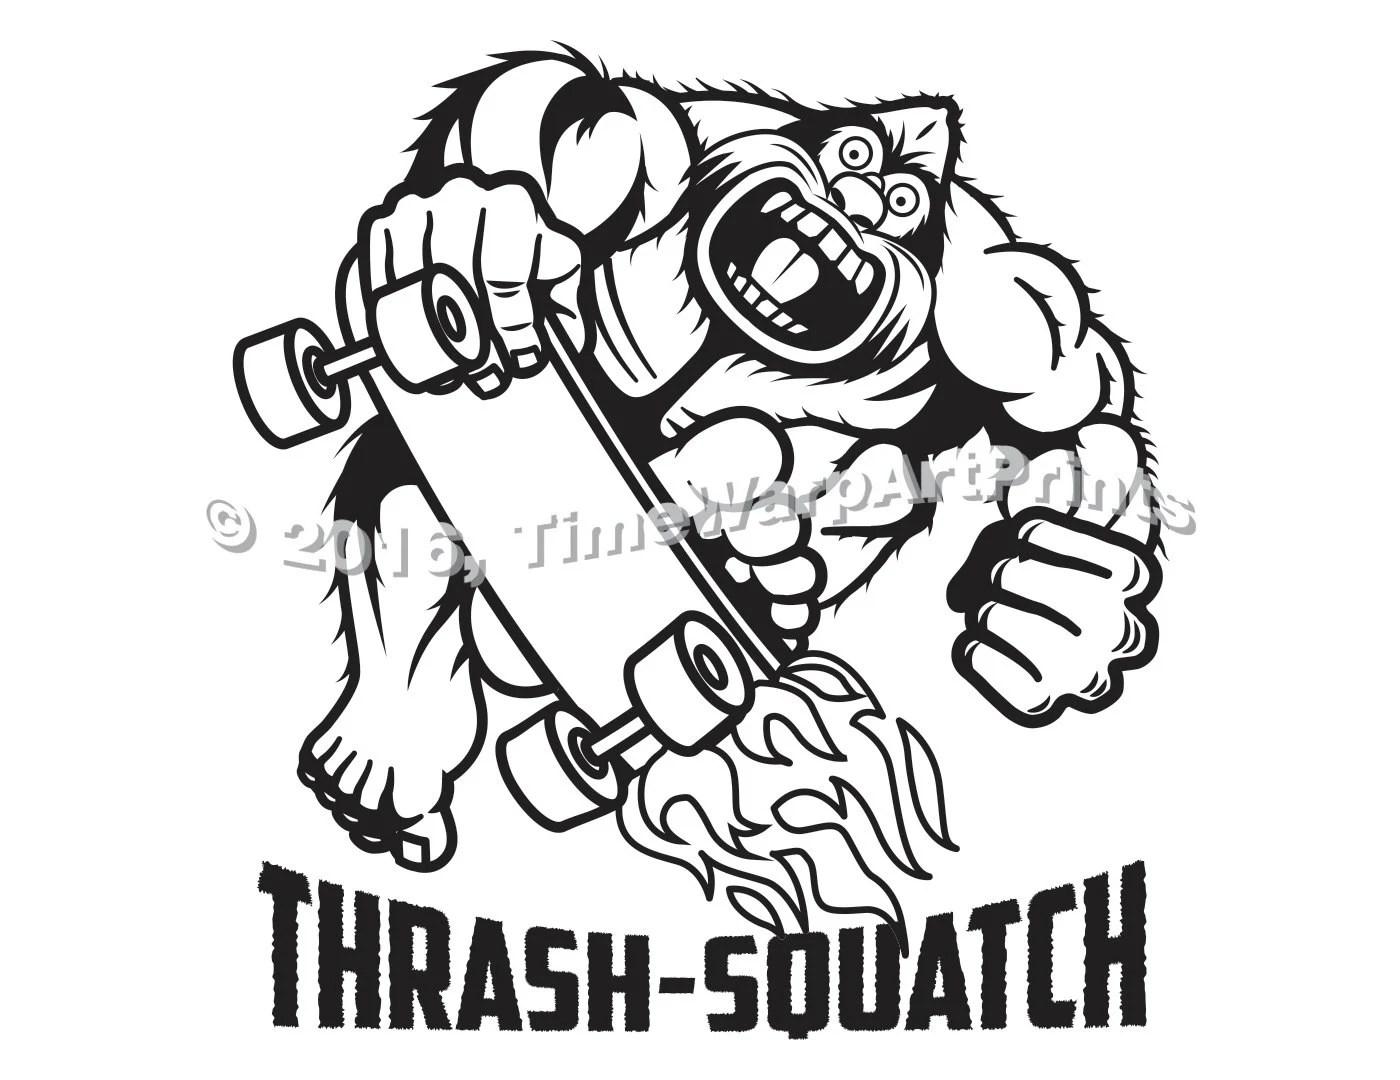 Thrash Squatch Skateboarding Bigfoot Sasquatch Graphic